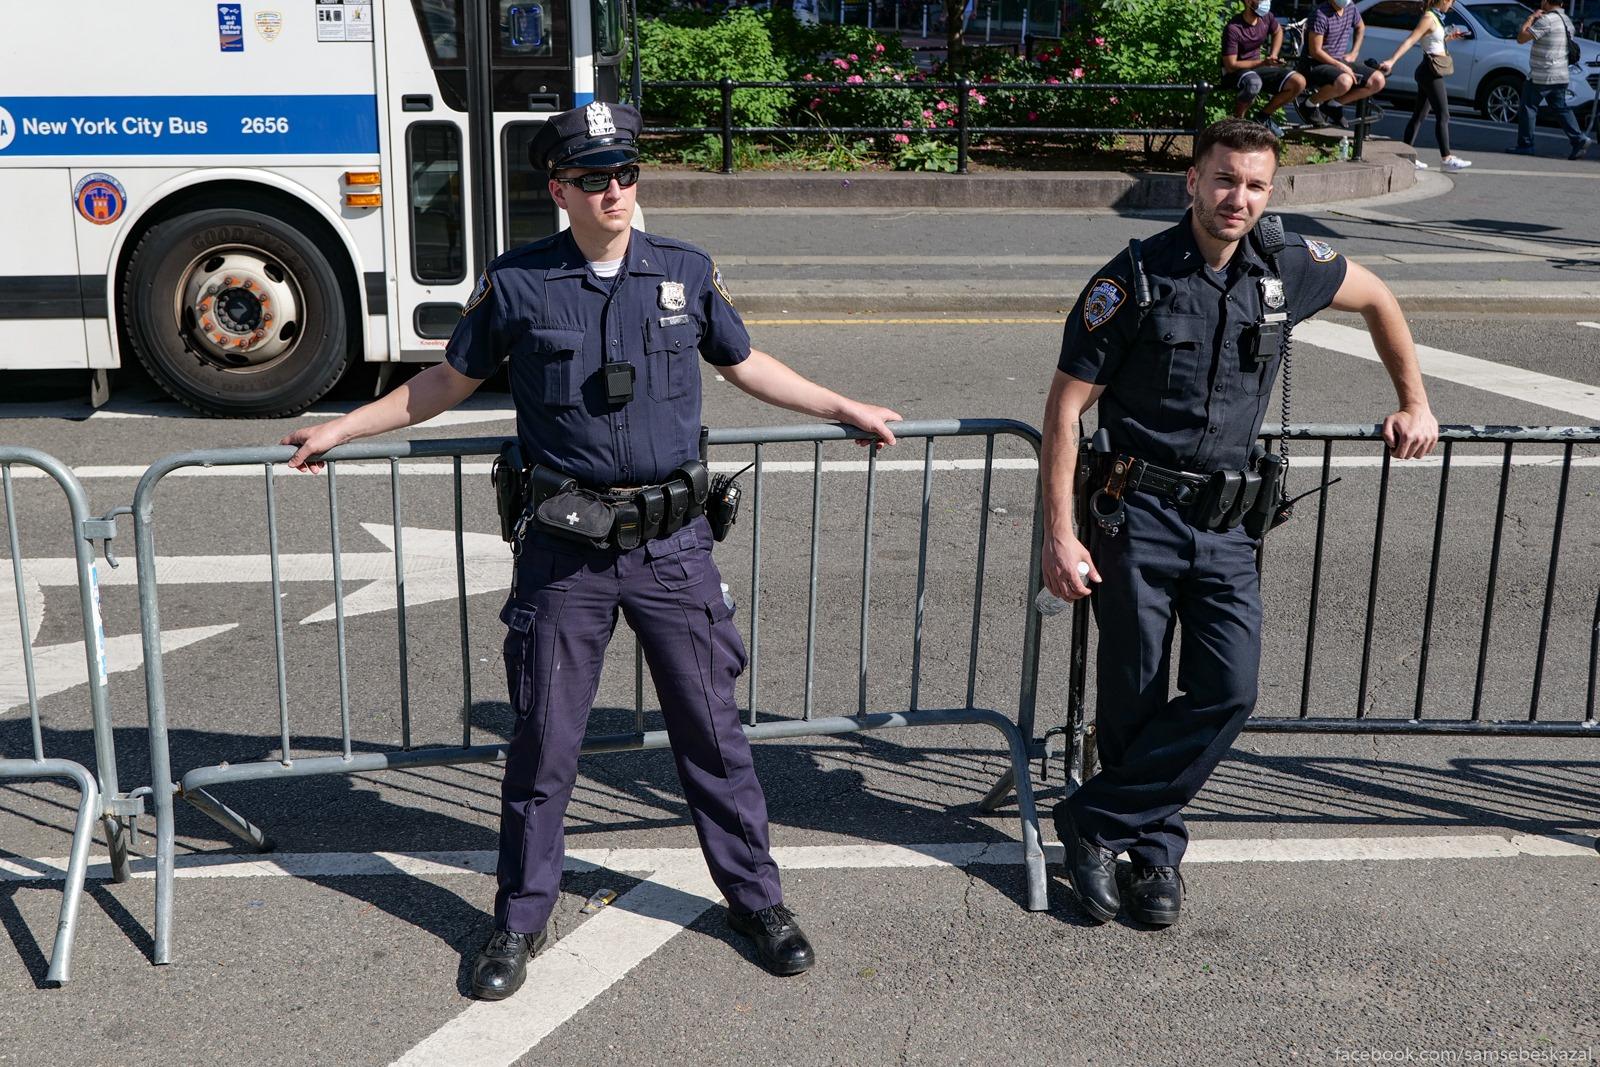 Policia teperʹ ni vo cto ne...